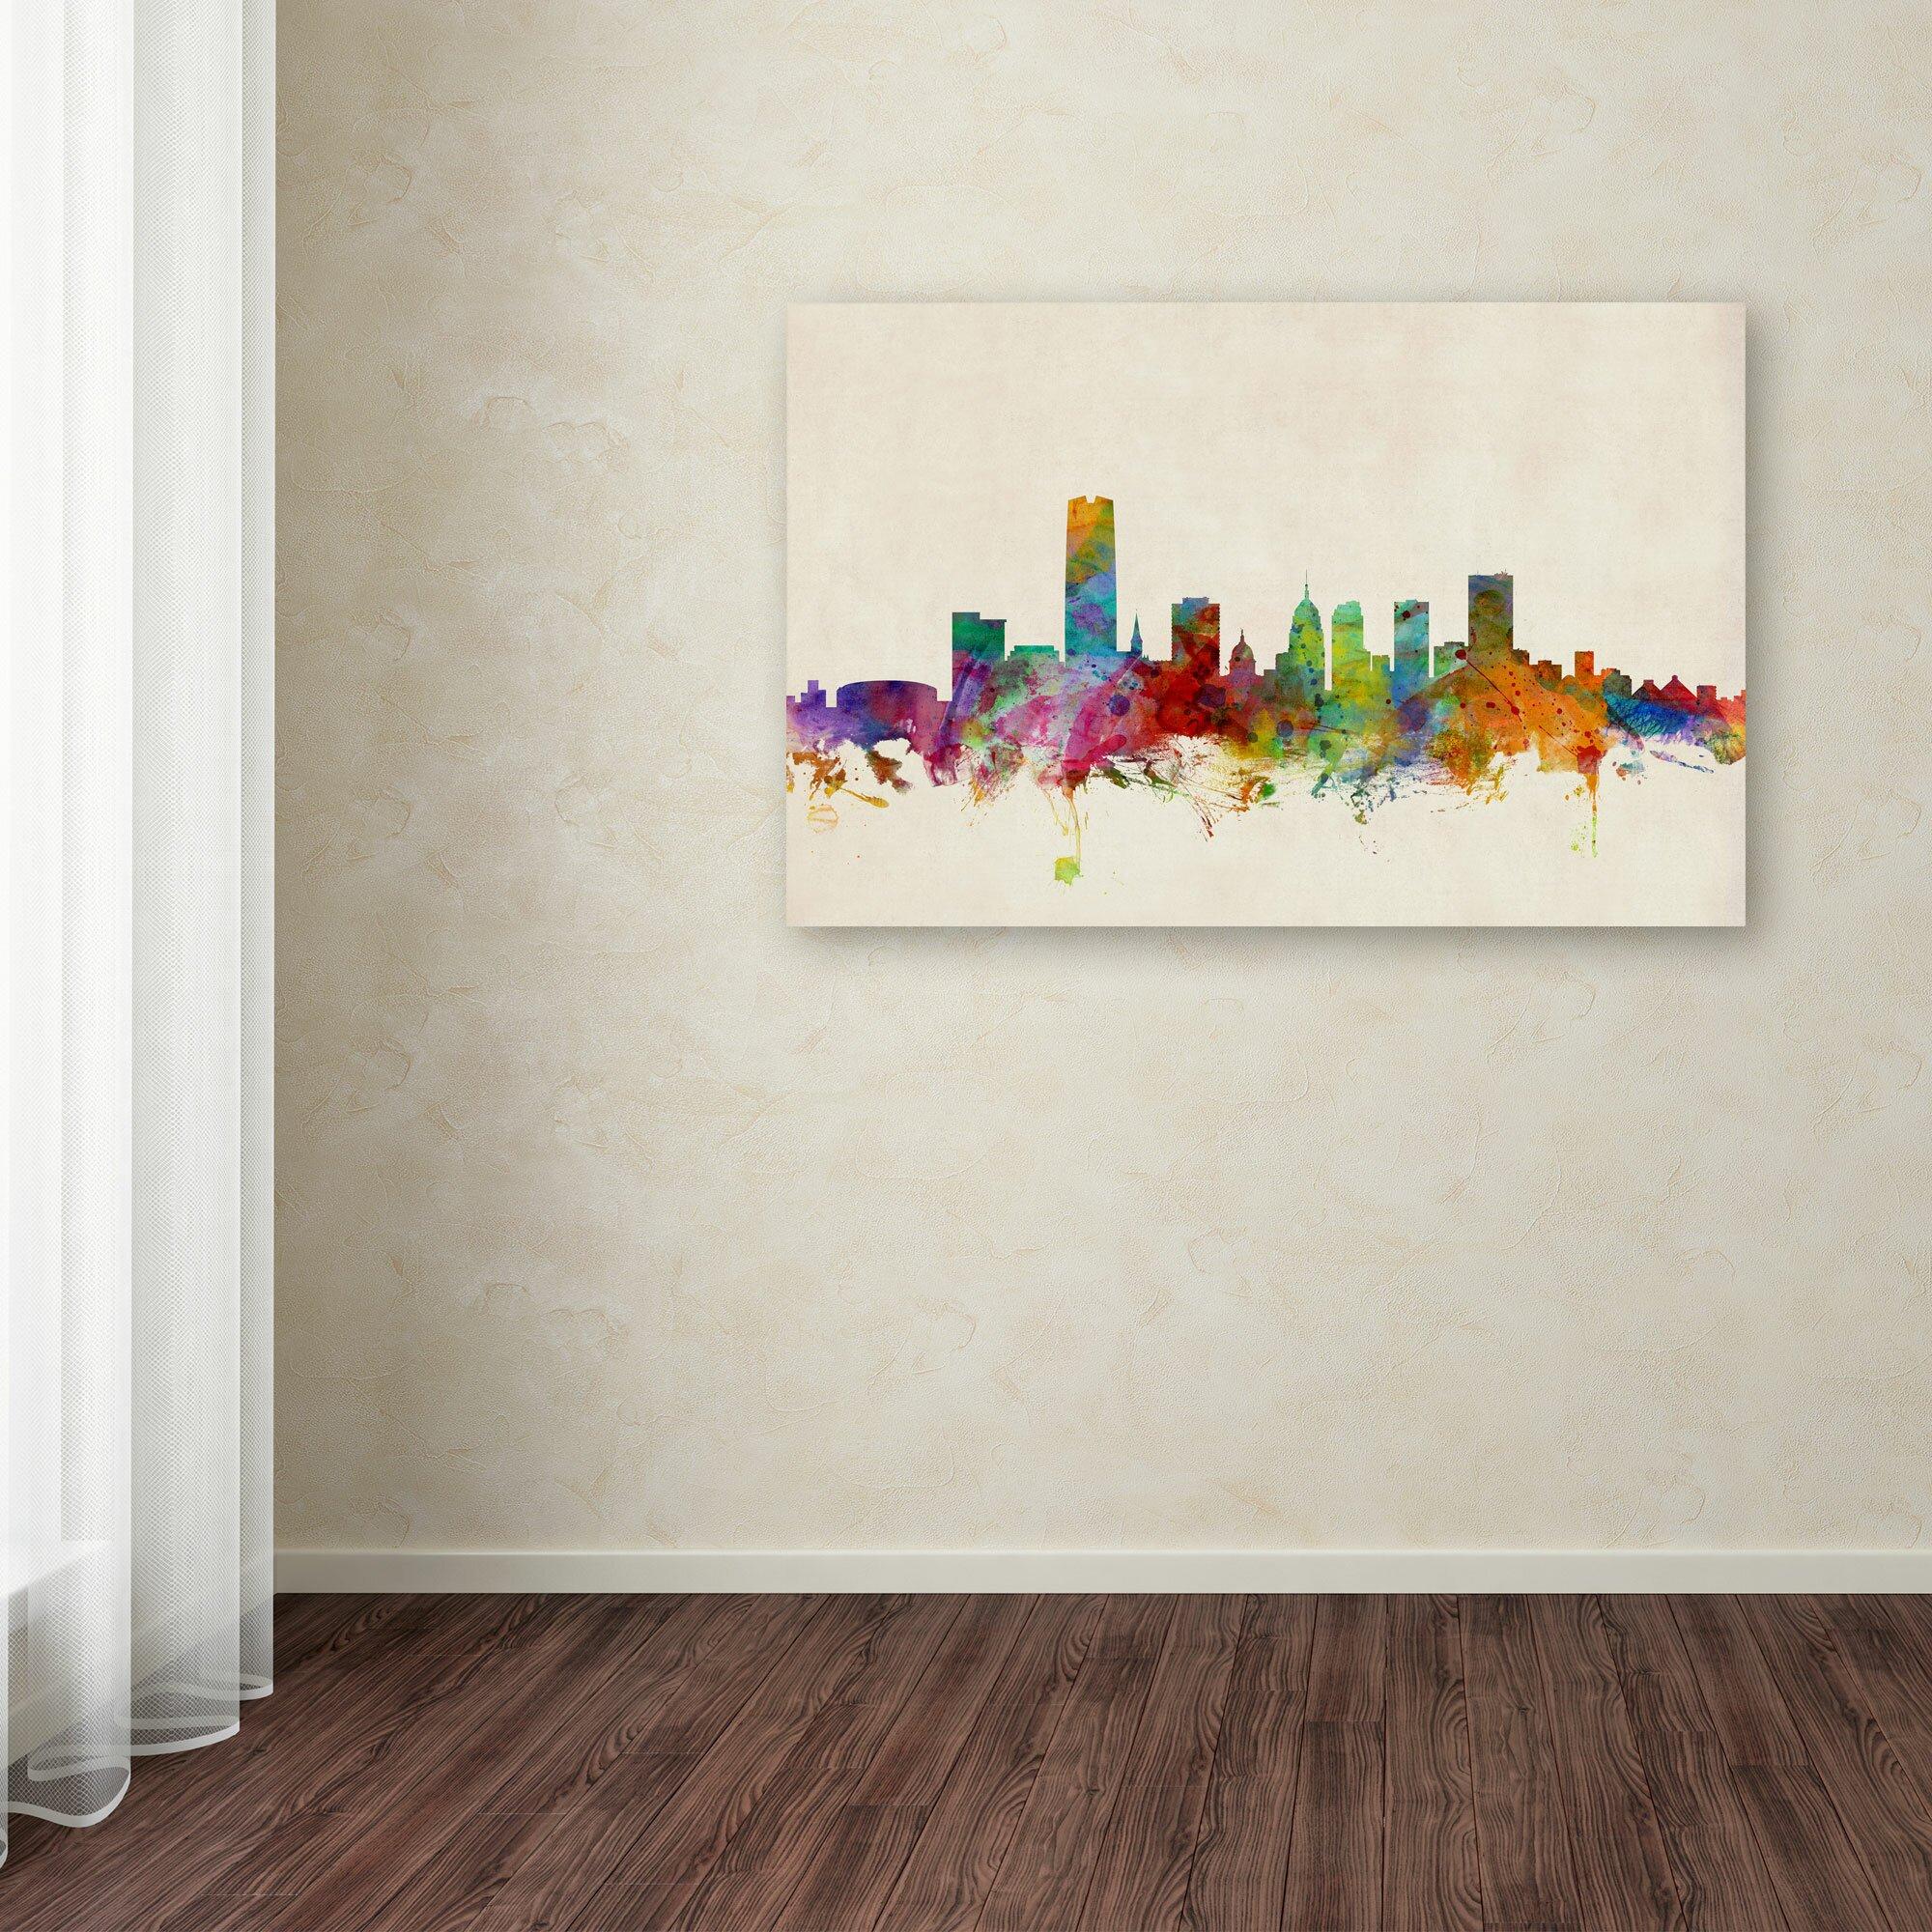 Garage door repair oklahoma city - Trademark Fine Art Oklahoma City Skyline By Michael Tompsett Graphic Art